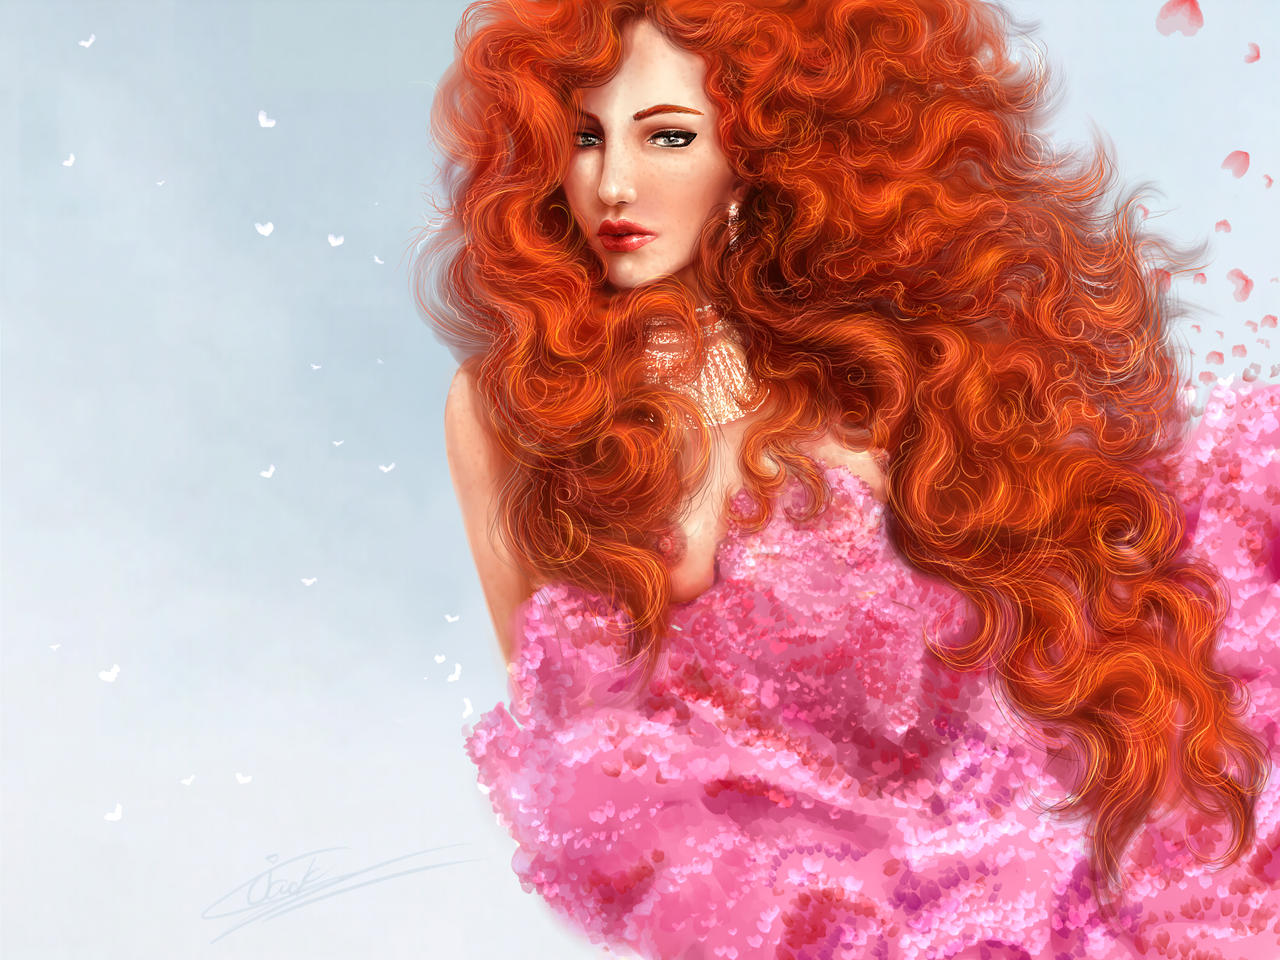 Red Haired Girl By Longrand On Deviantart